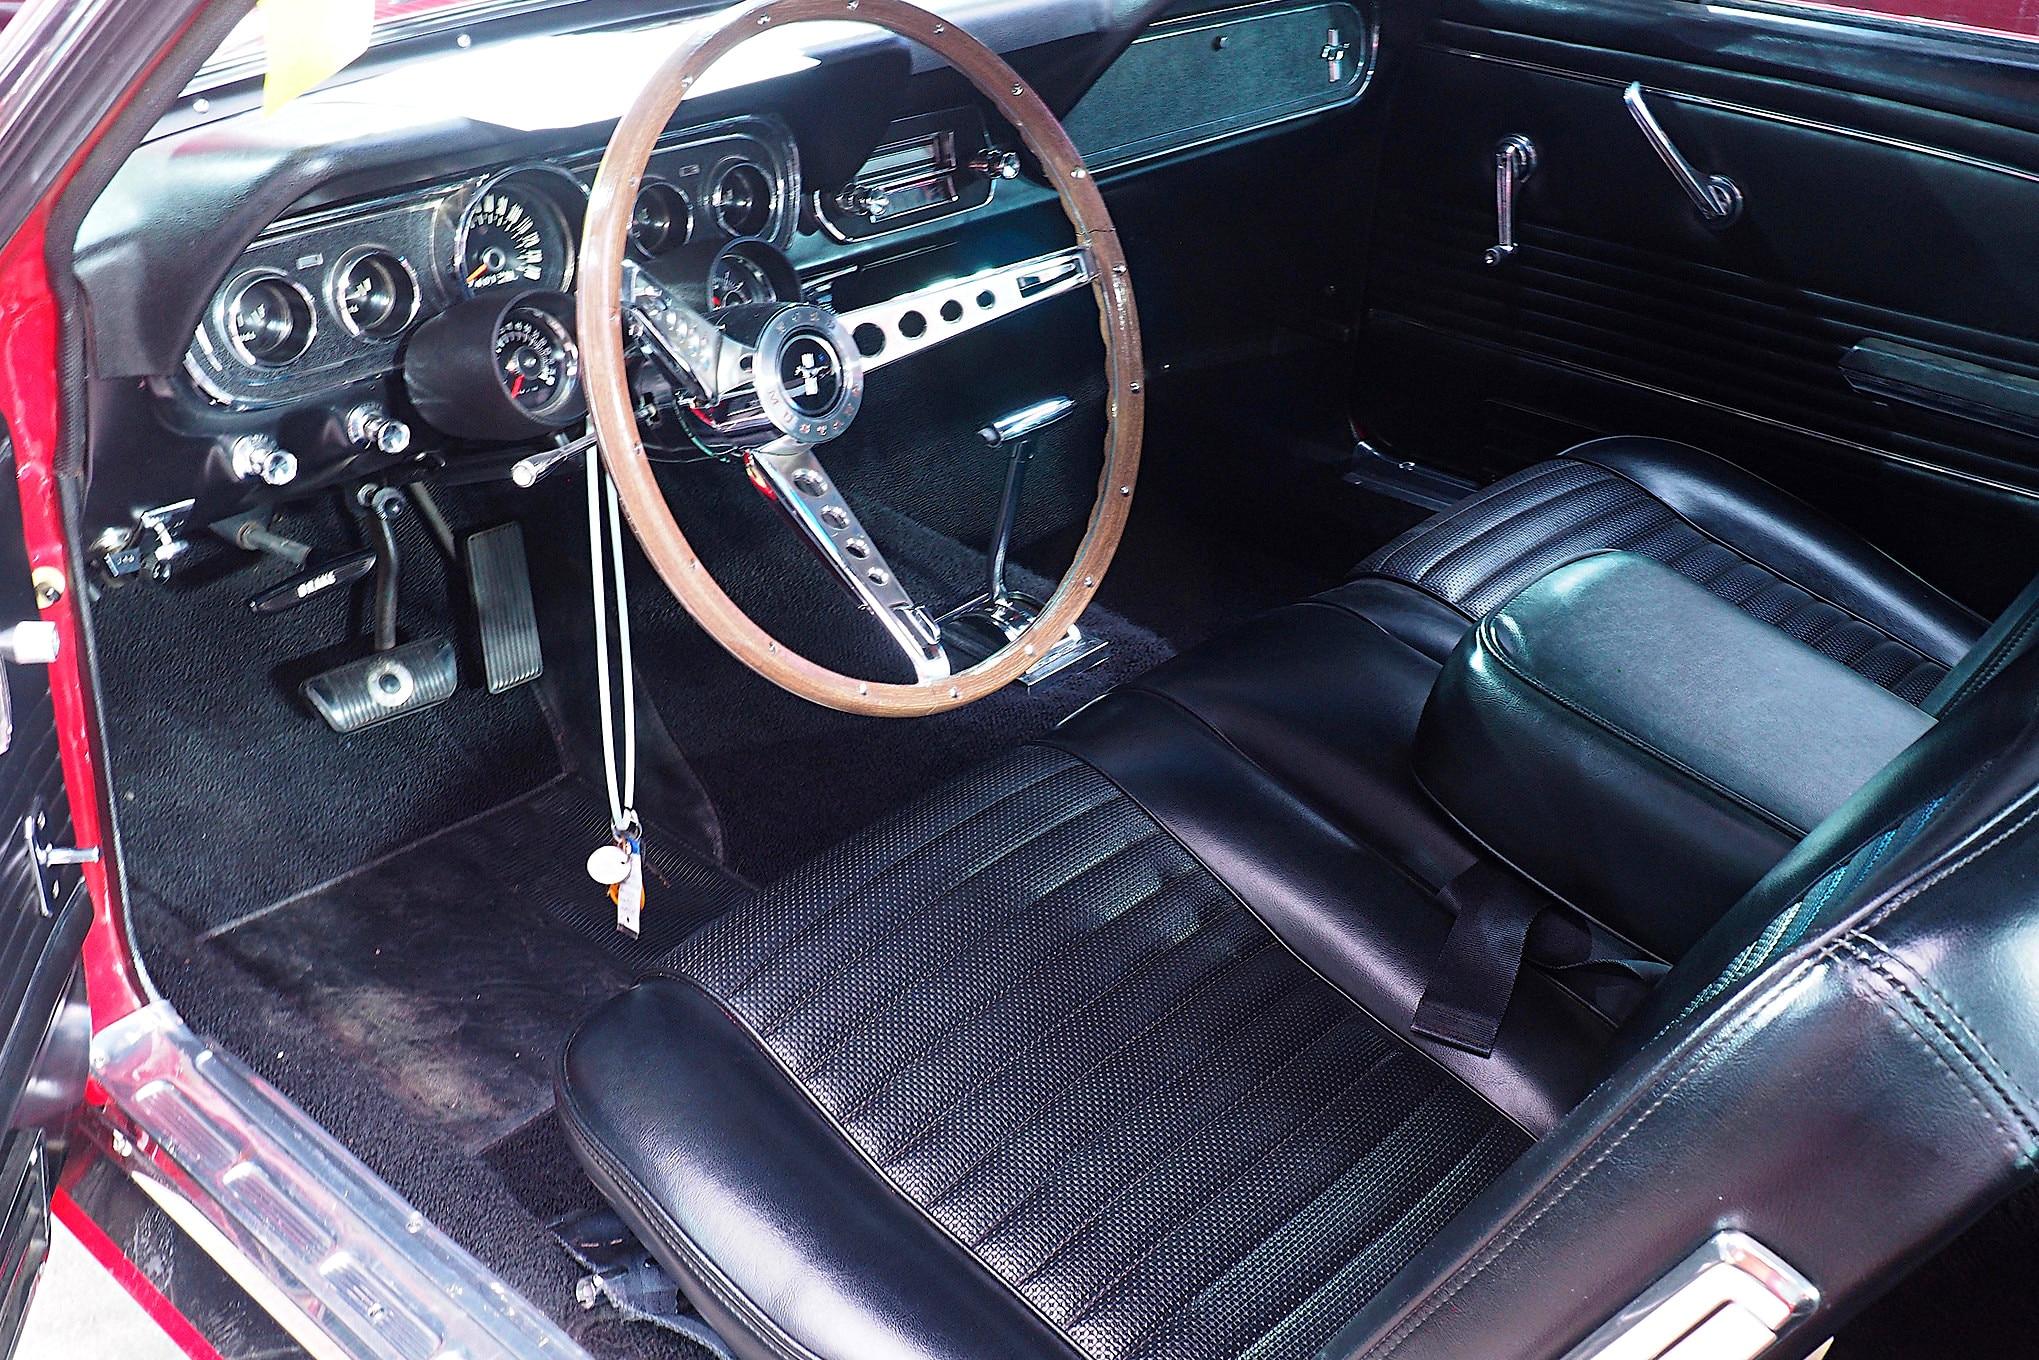 Marvelous 1966 Mustang Bench Seat Mecum Arizona 2019 Photo 266419508 Ibusinesslaw Wood Chair Design Ideas Ibusinesslaworg